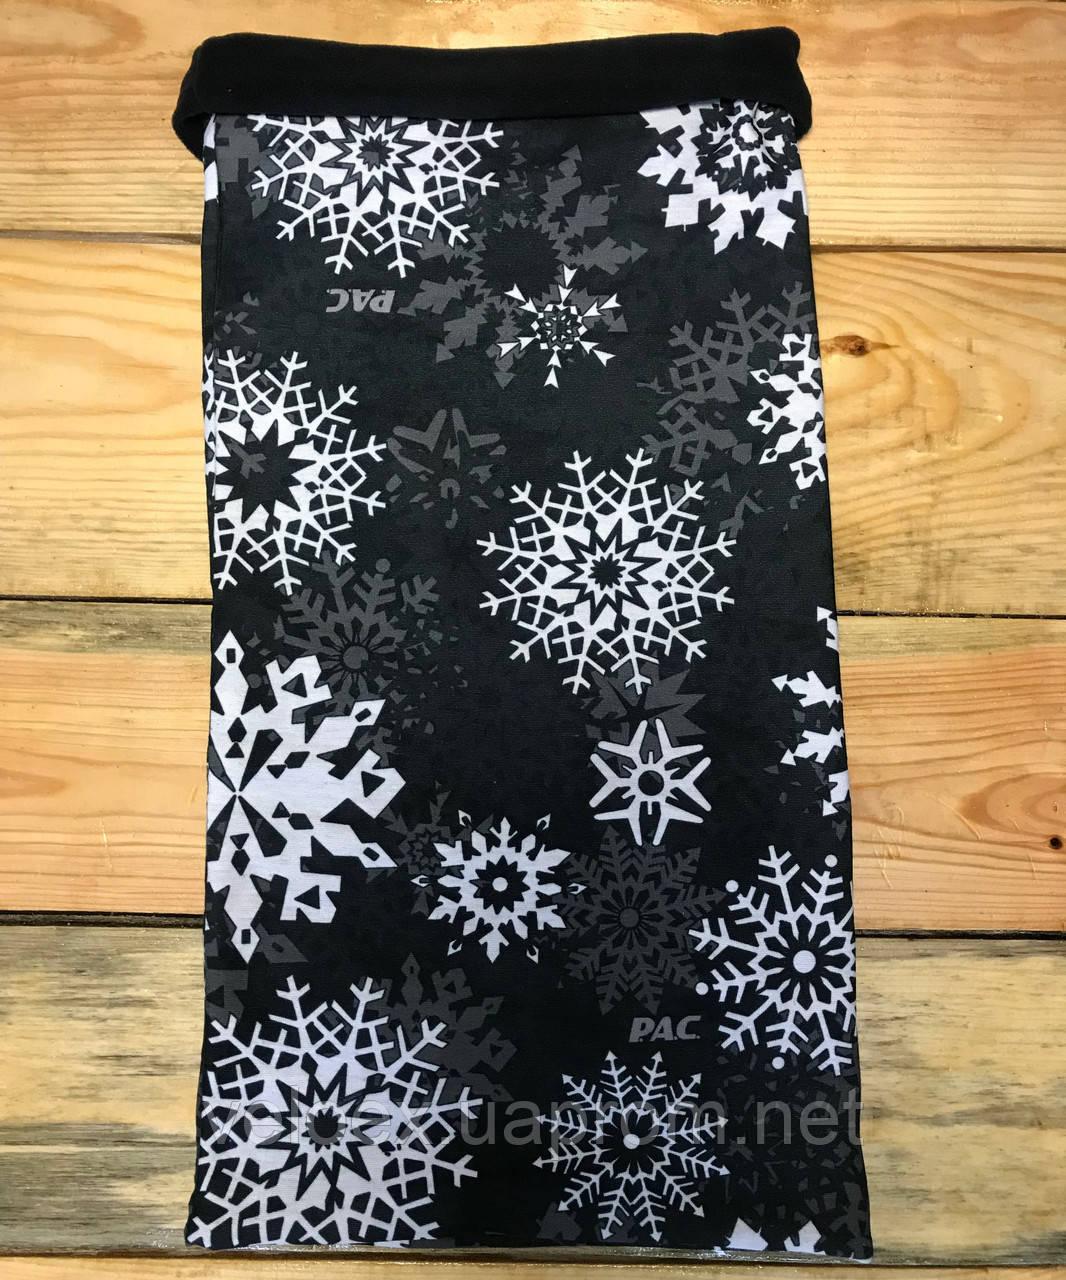 Головной убор P.A.C. Twisted Fleece Ice Crystal Black, фото 1